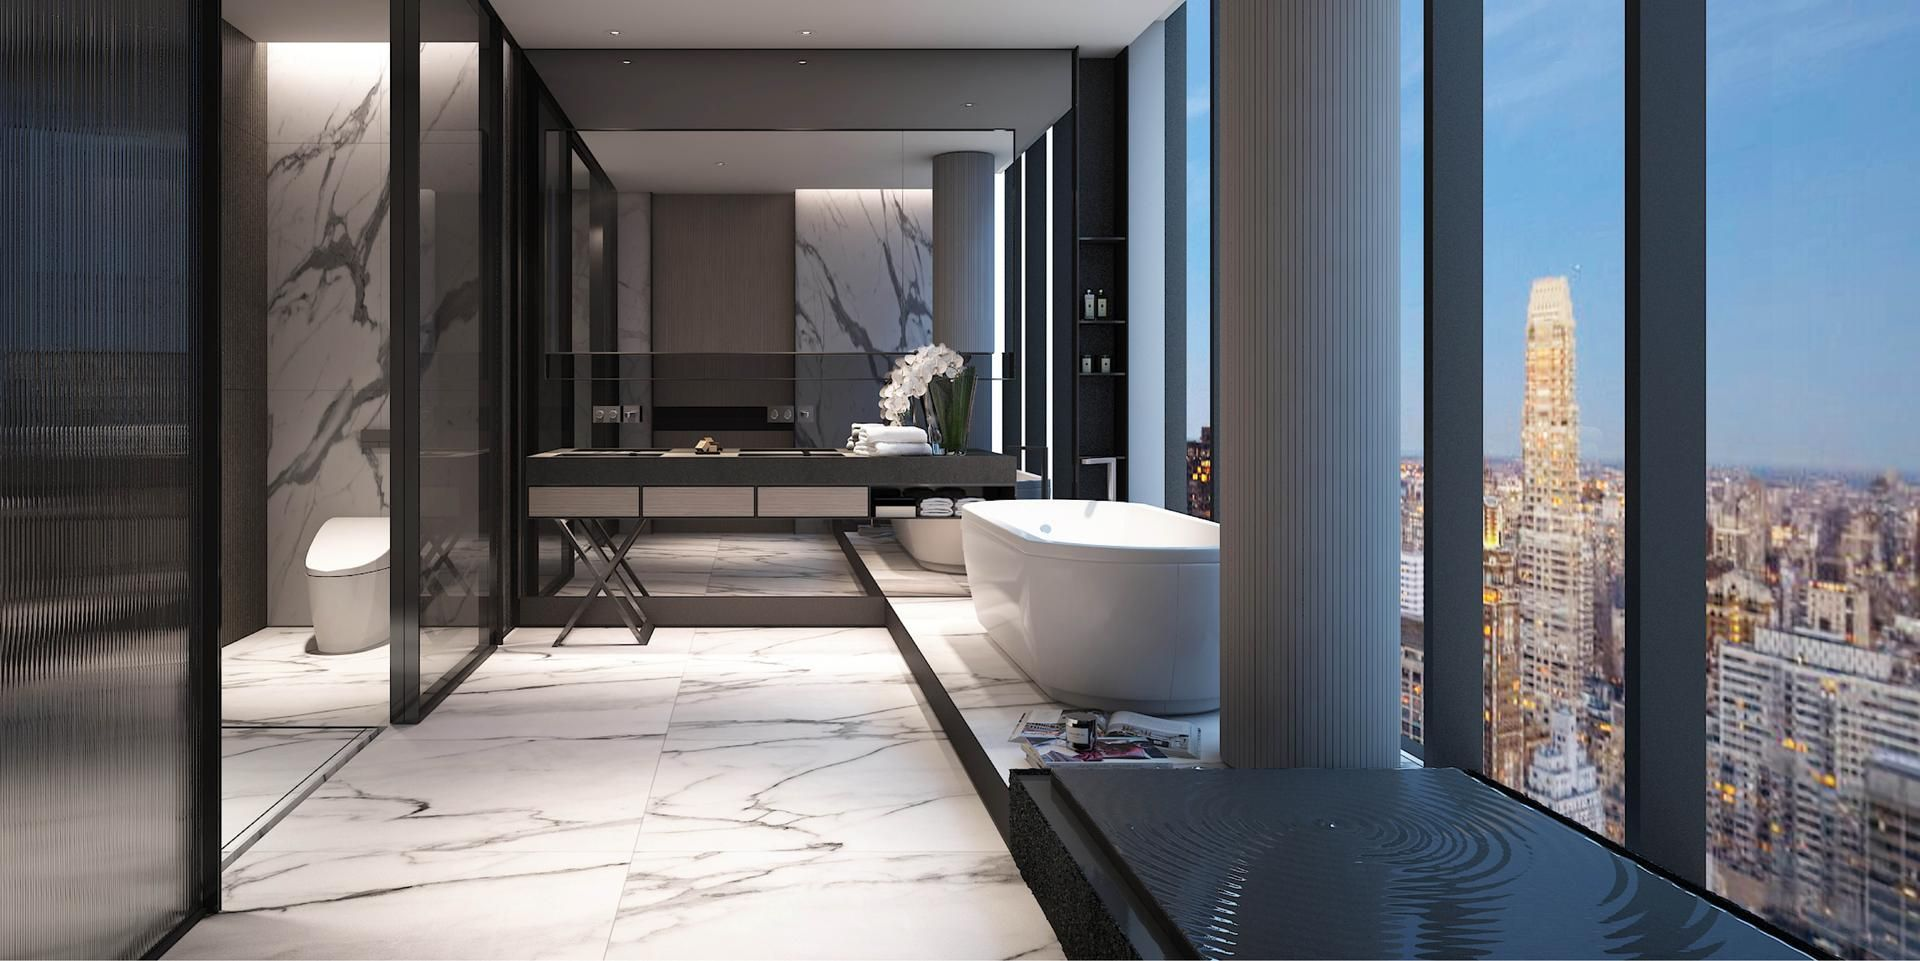 Pin By Jeremy On Tham Khảo Bathroom Inspiration Modern Restroom Design Bathroom Interior